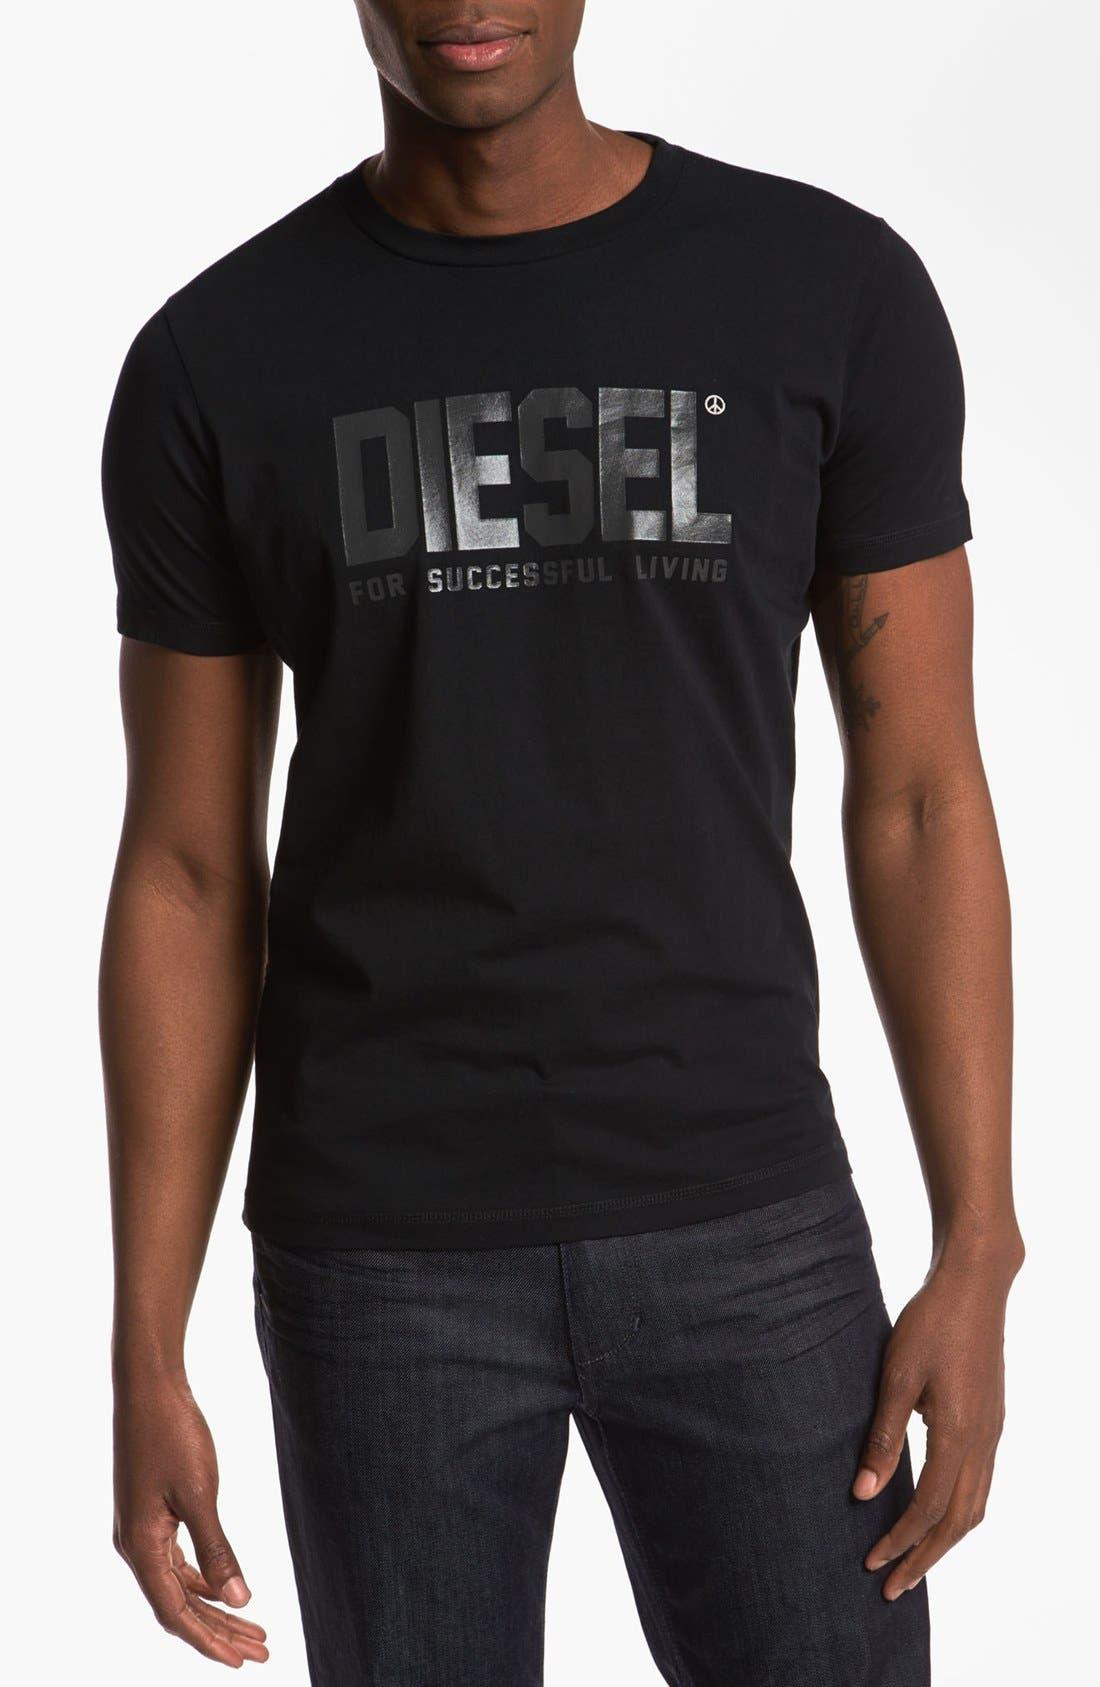 Alternate Image 1 Selected - DIESEL® 'T-Life' T-Shirt